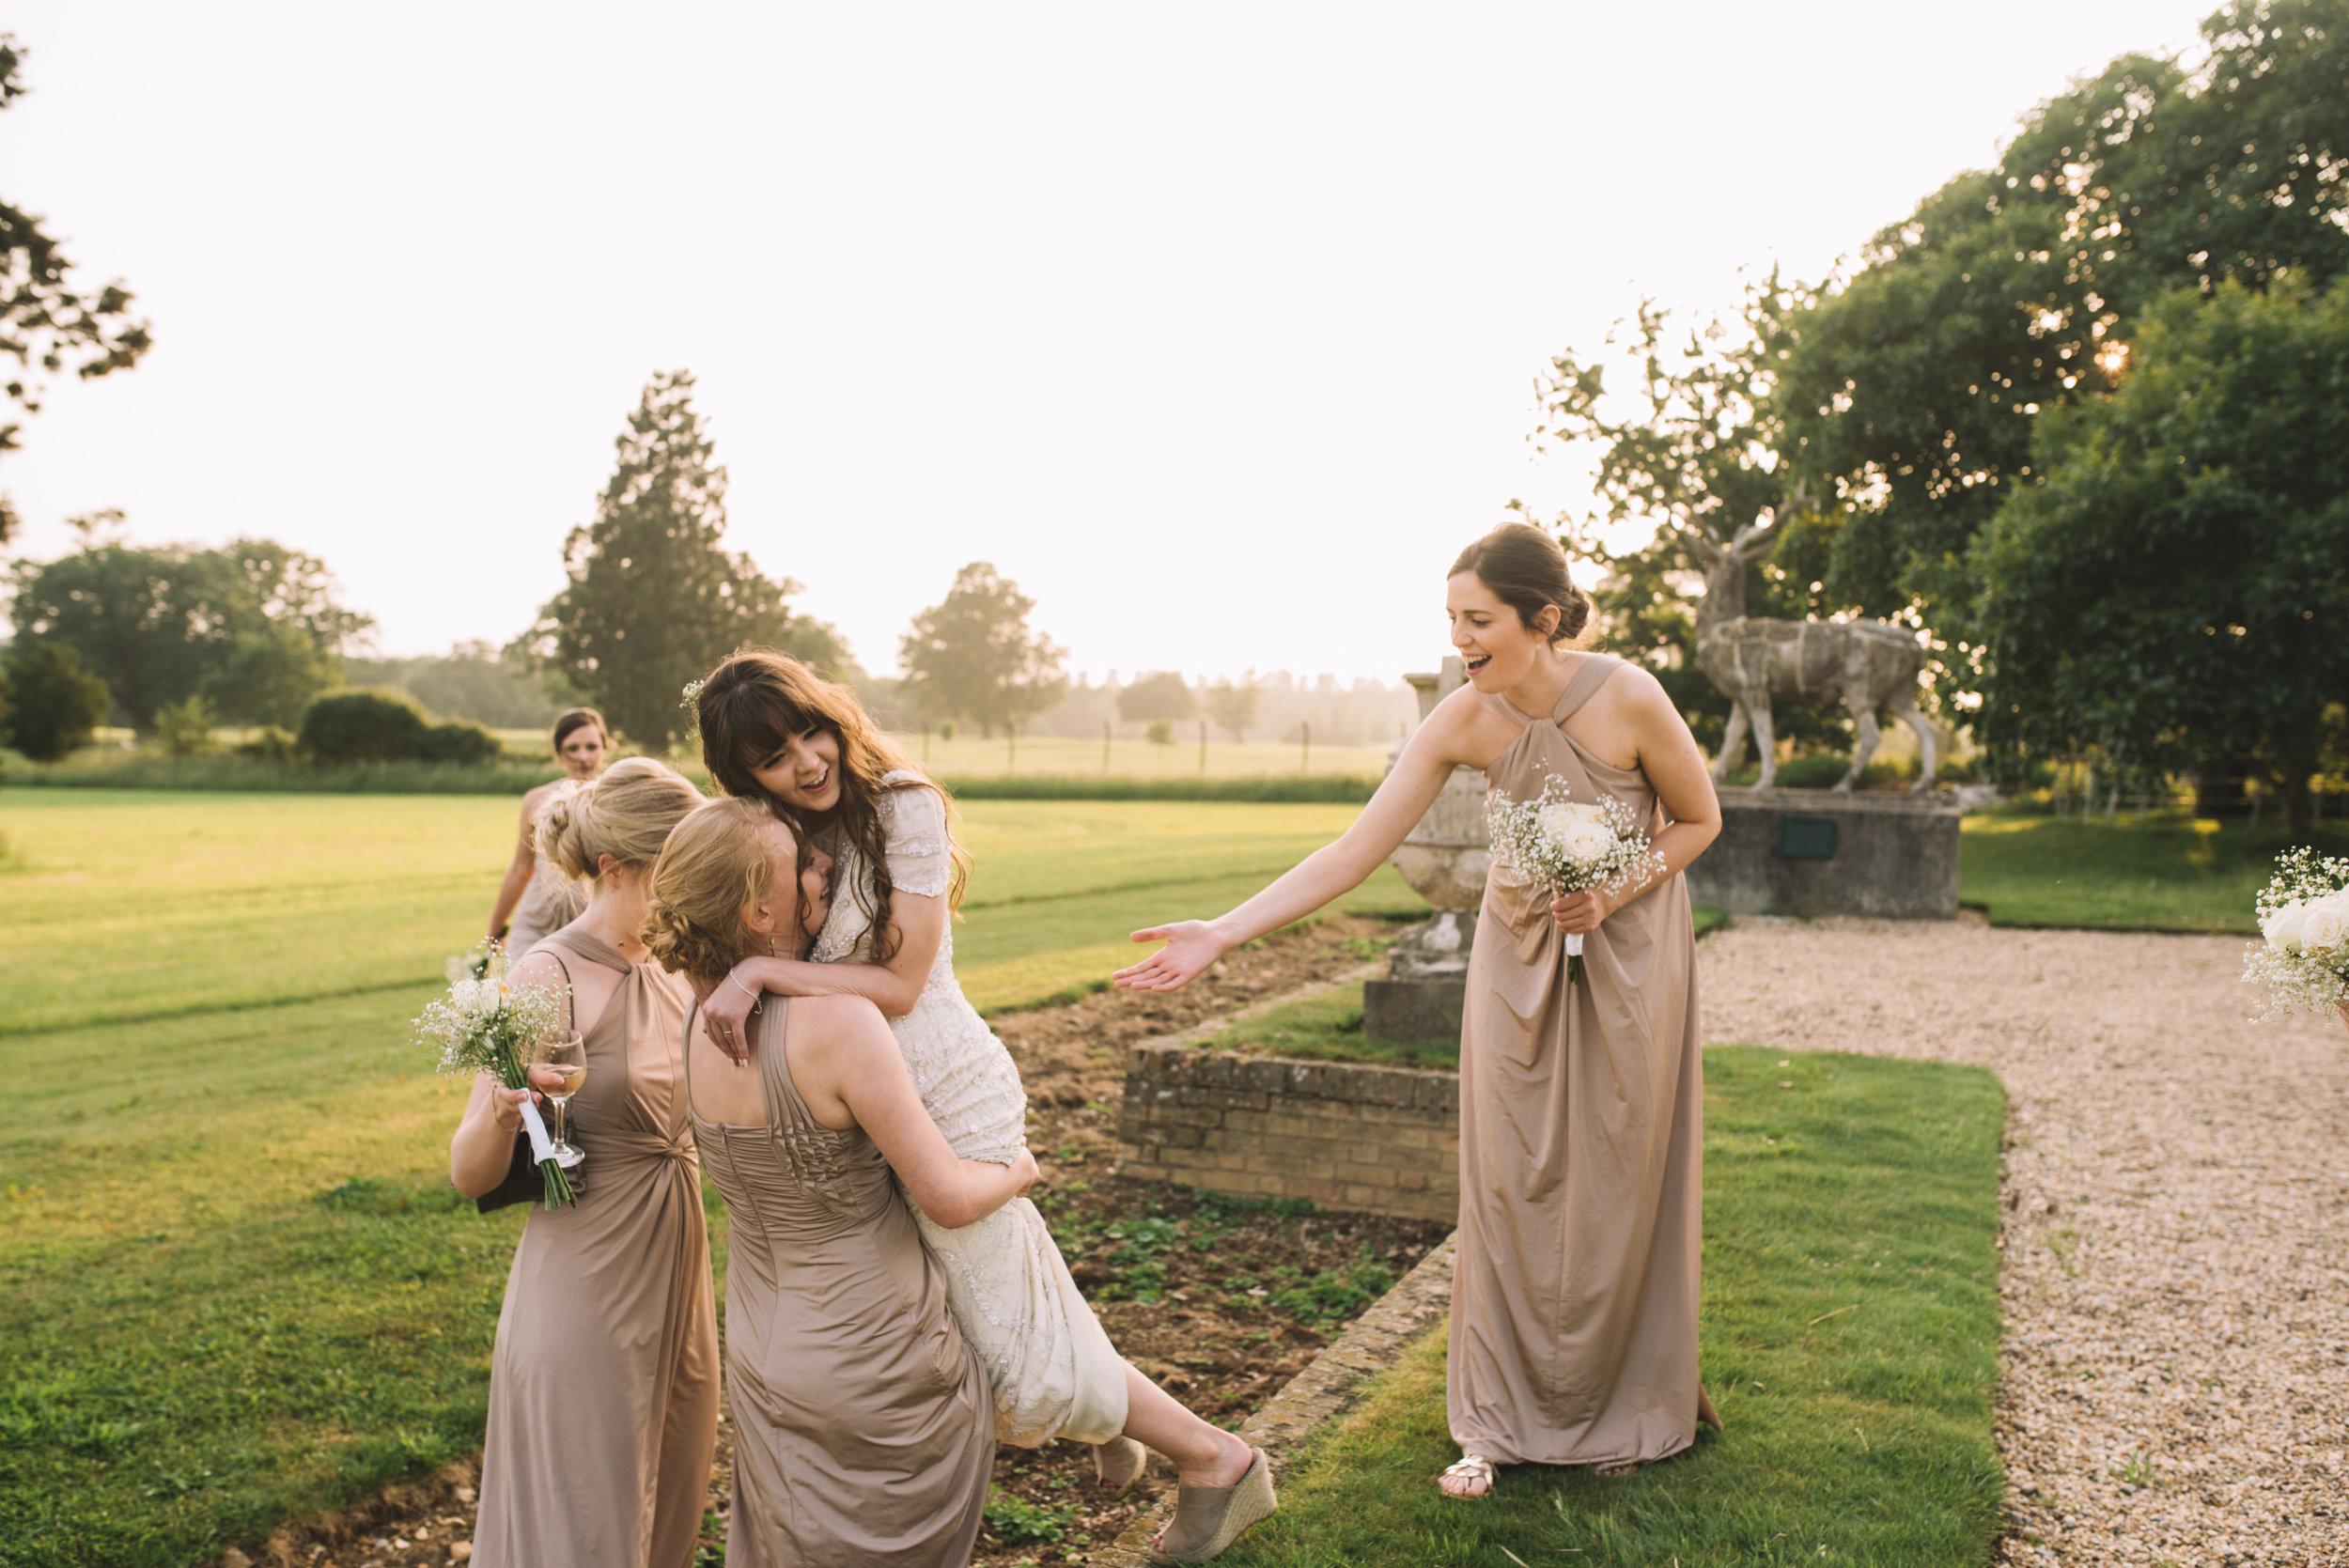 Gosfield Hall, Essex wedding photographer, Lucie Watson Photography